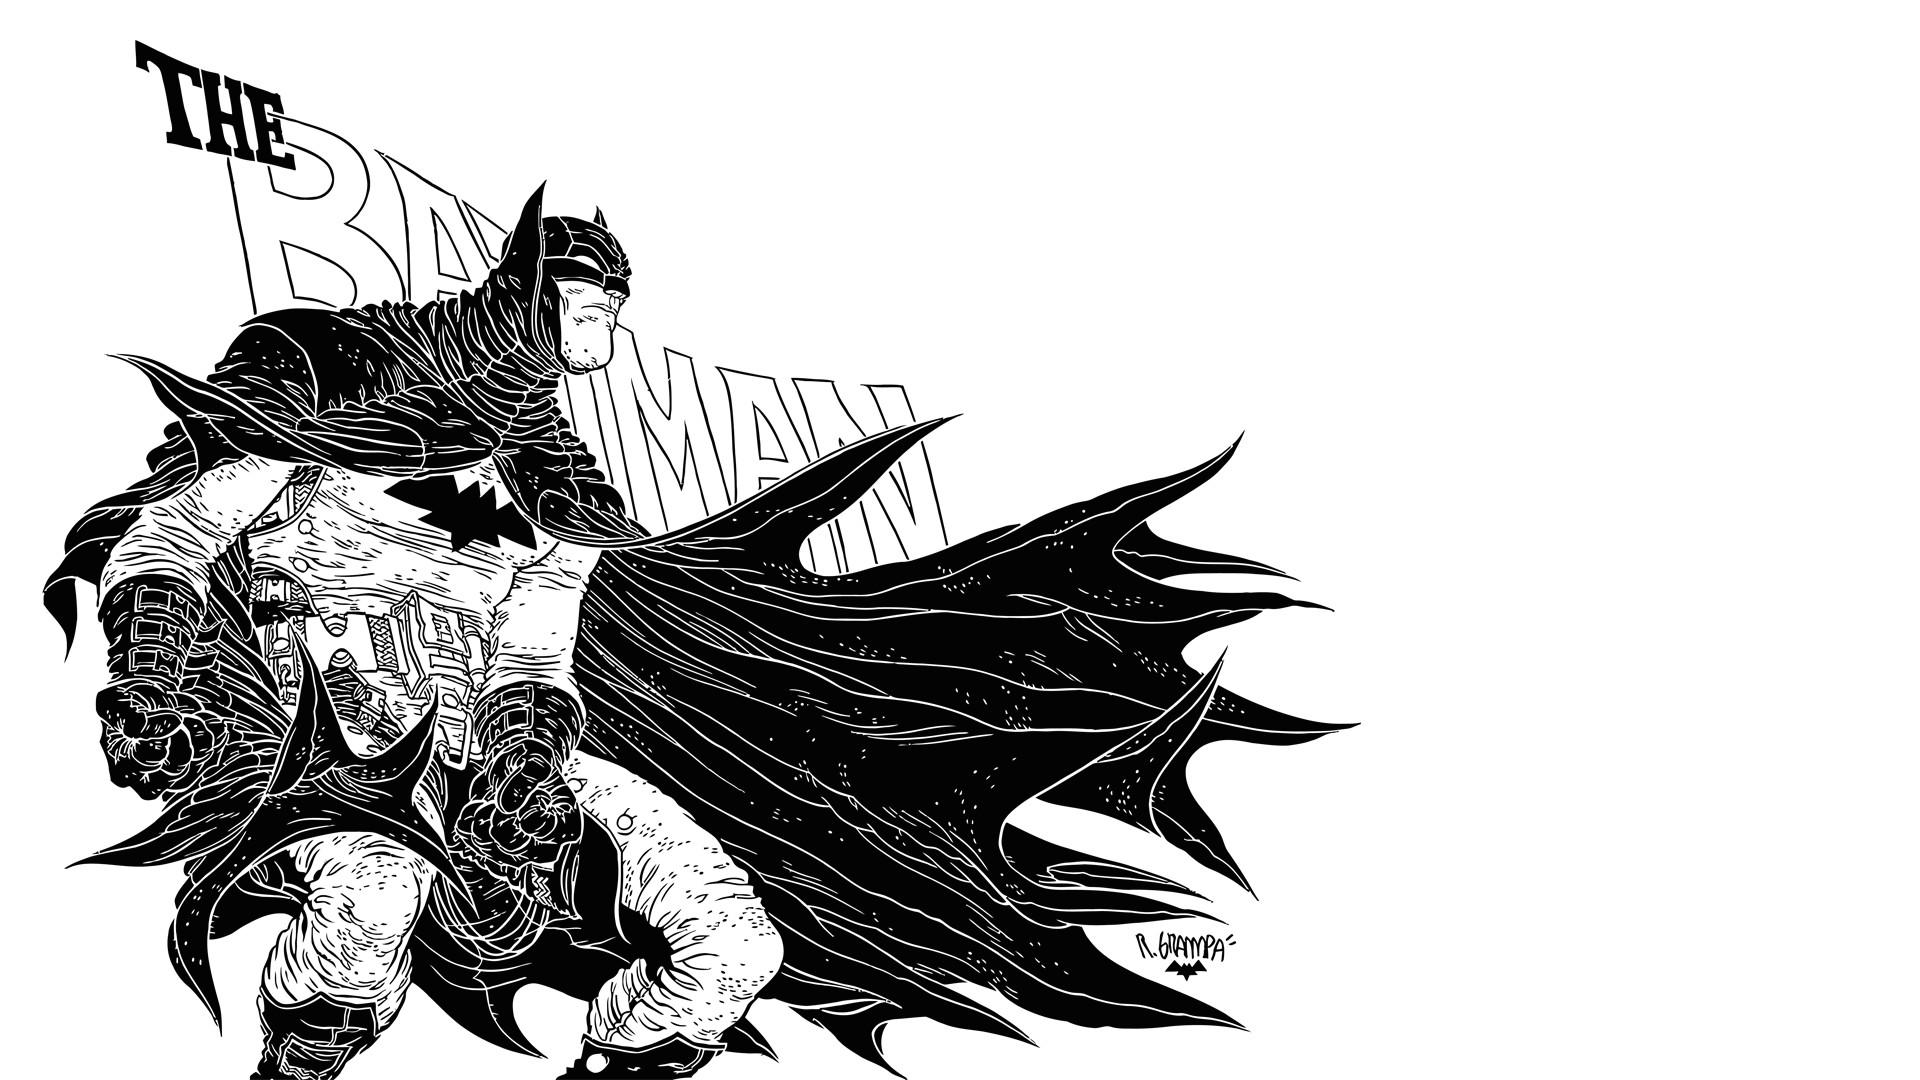 The Batman by Rafael Grampa – wallpaper (xpost from  /r/ComicWalls) …